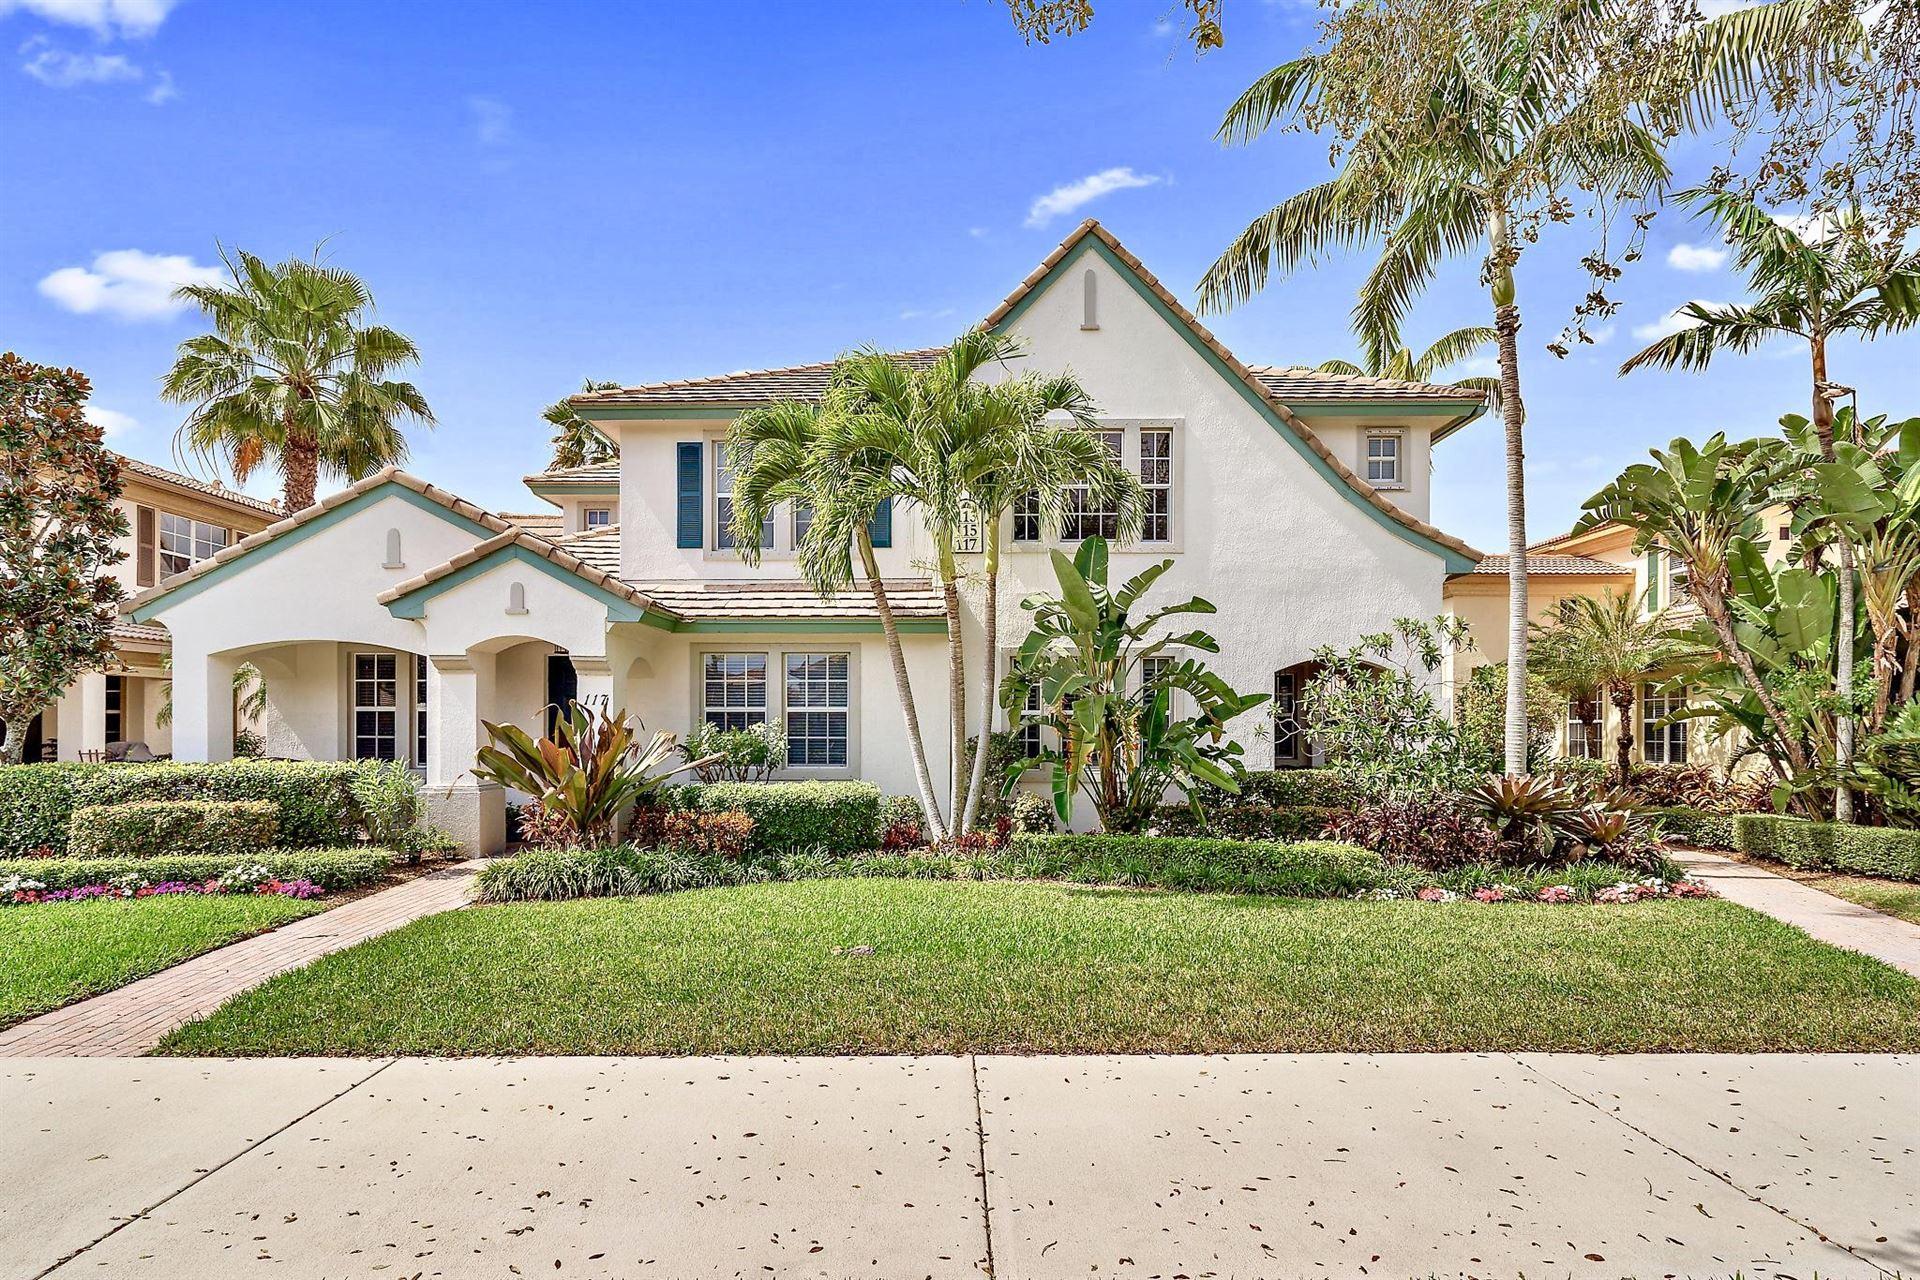 Photo of 113 Evergrene Parkway #3-A, Palm Beach Gardens, FL 33410 (MLS # RX-10654113)